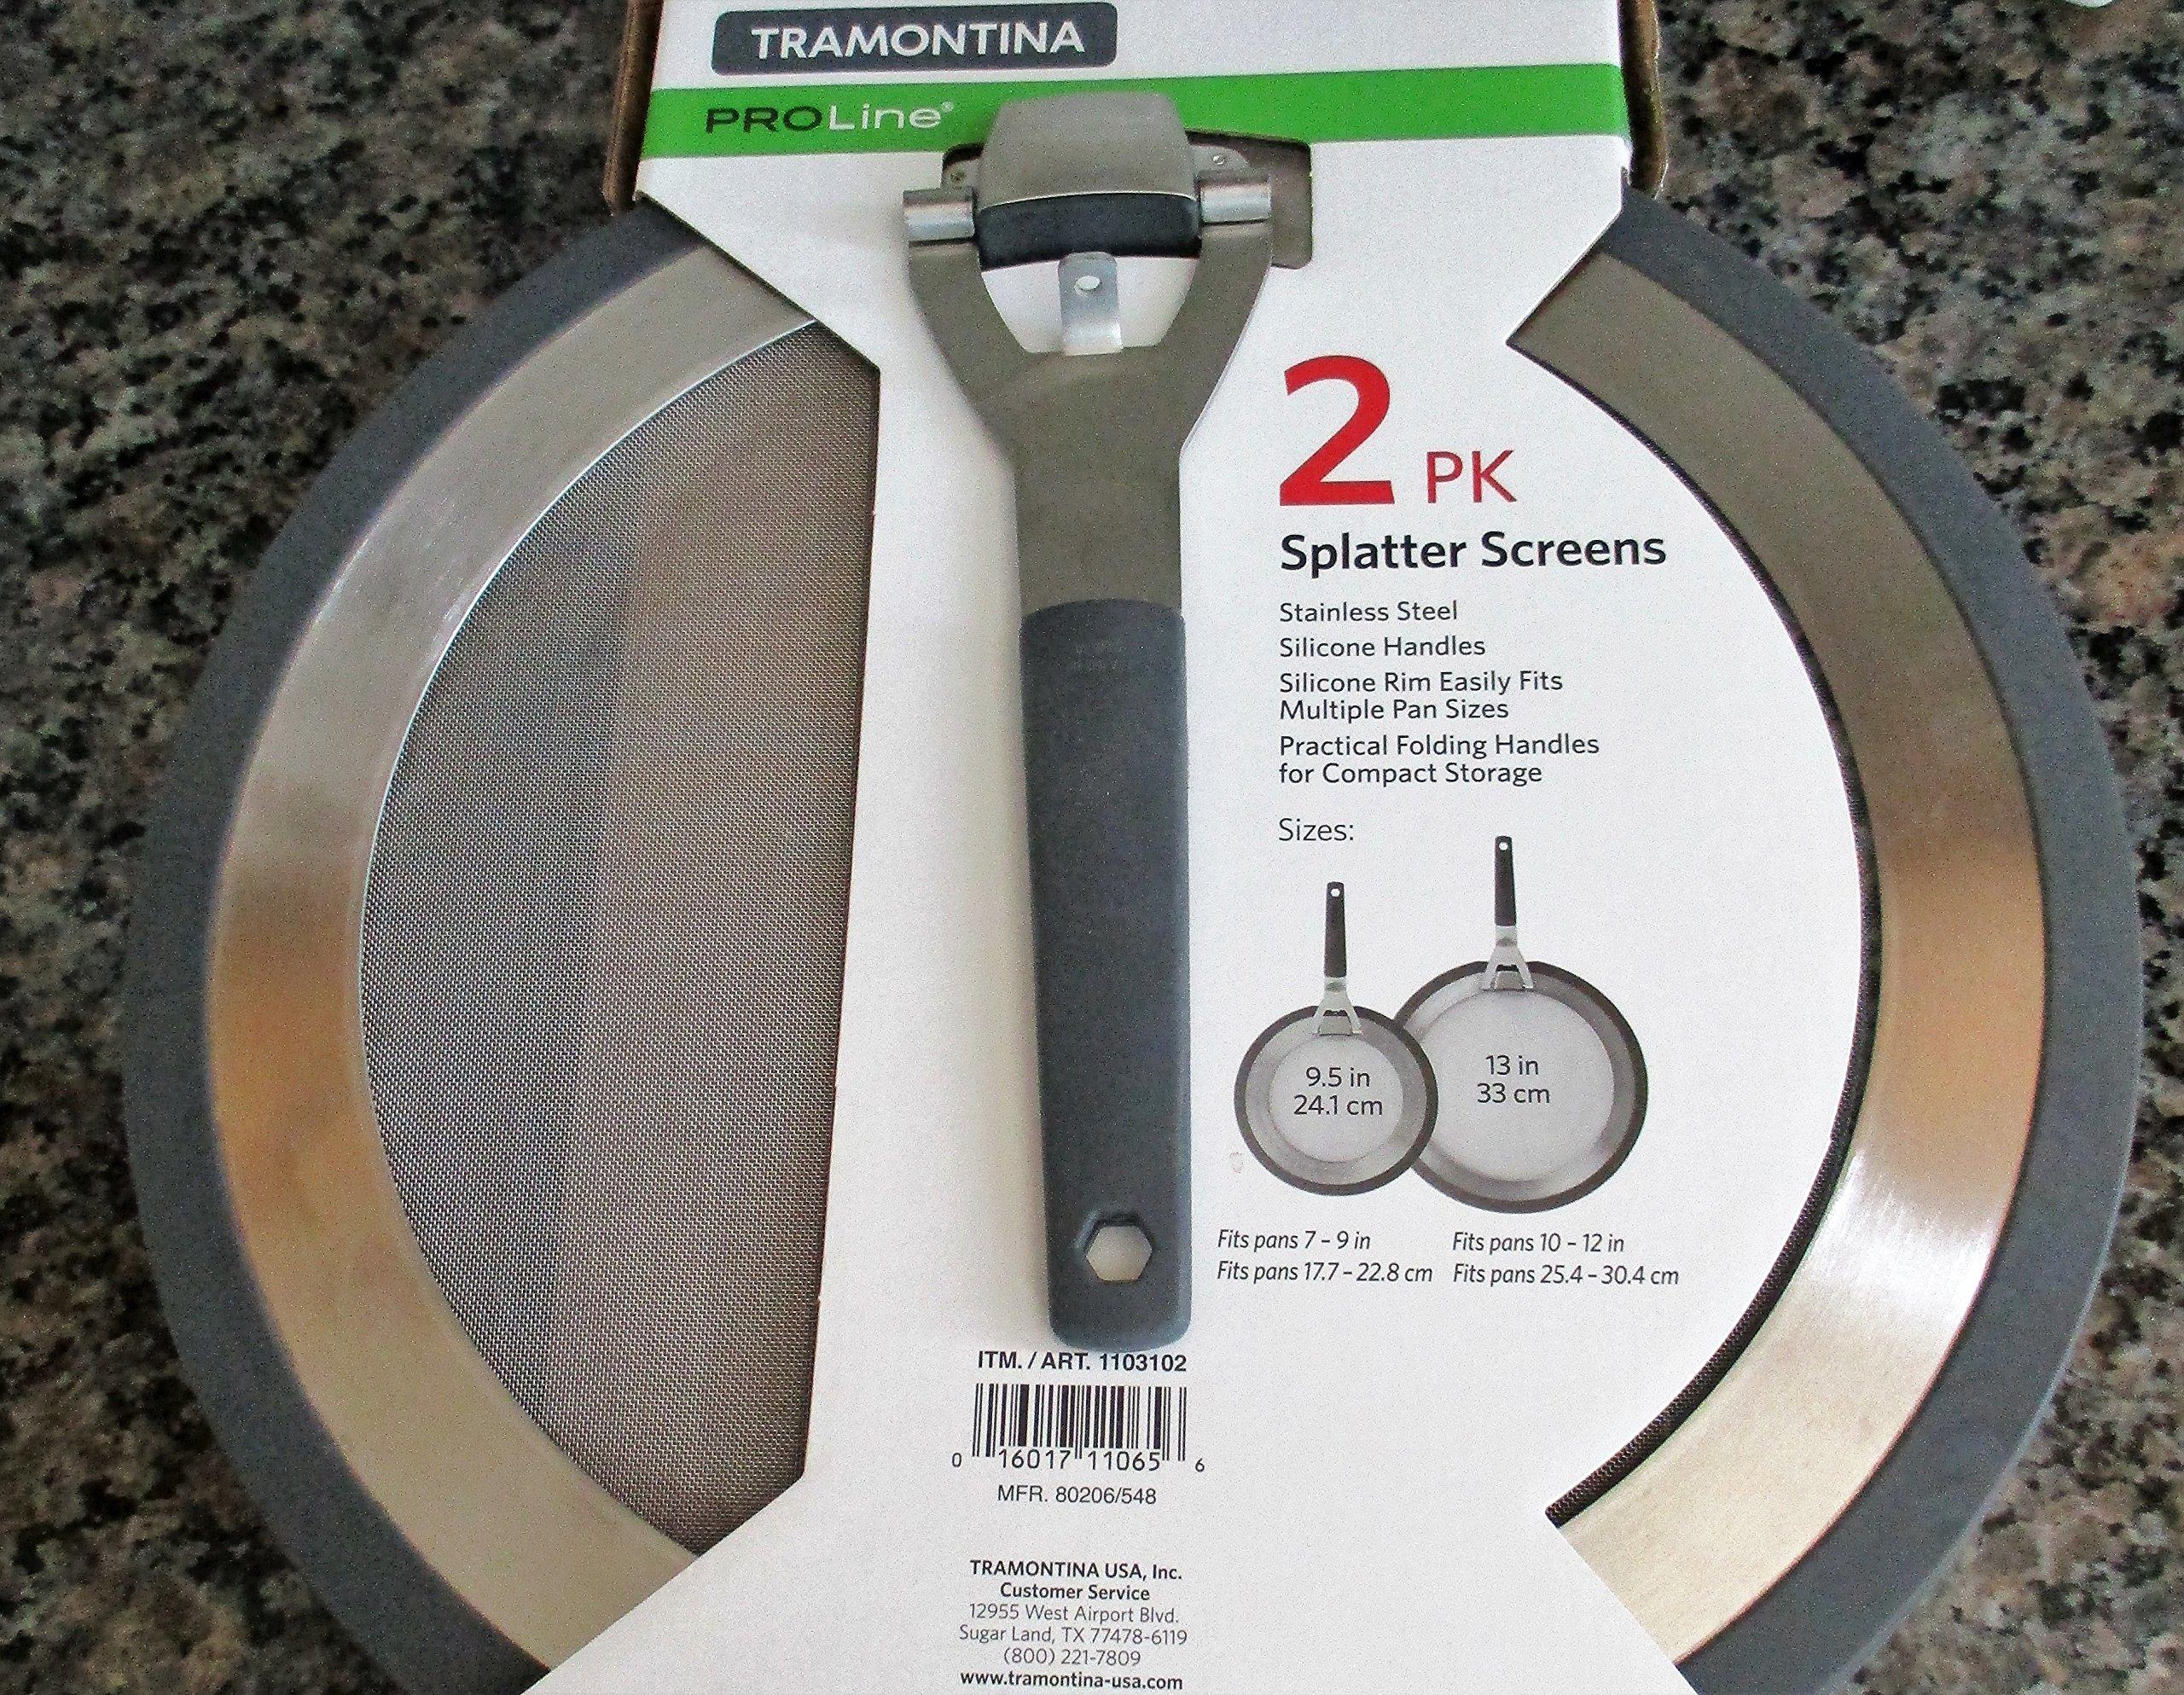 Tramontina Stainless Steel Splatter Screen 2 Pack